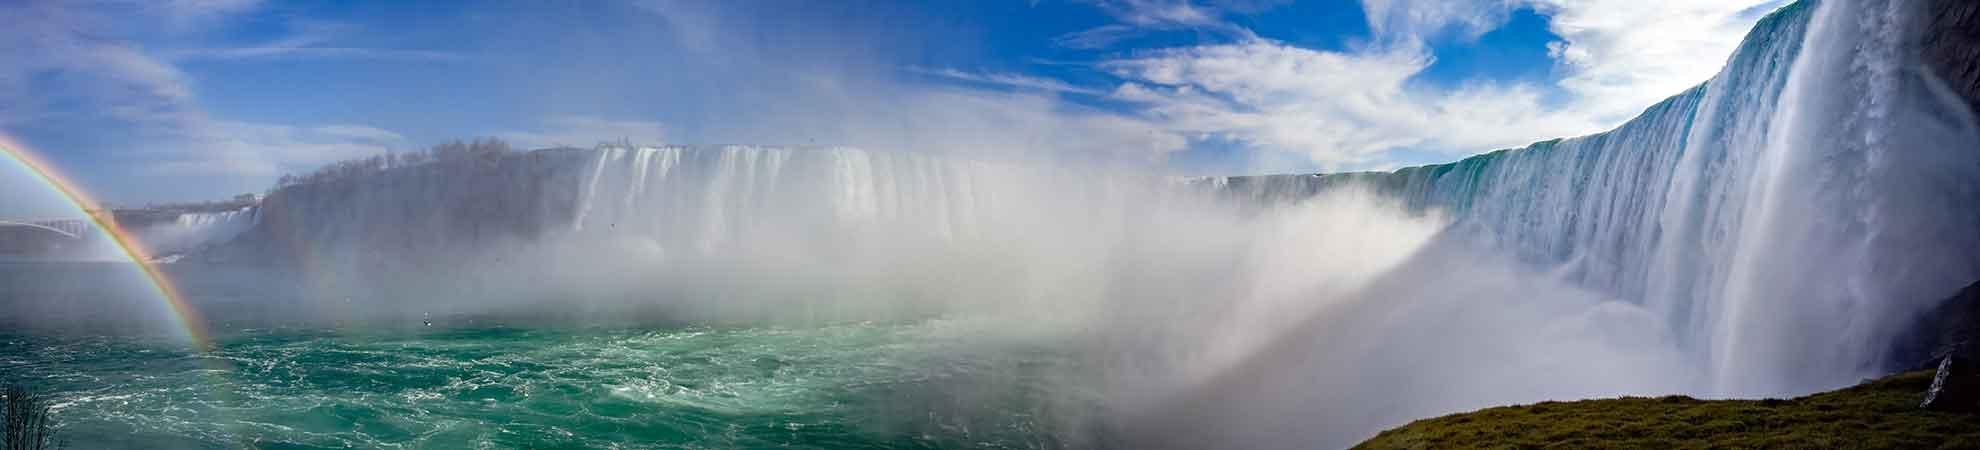 Voyage Chutes du Niagara